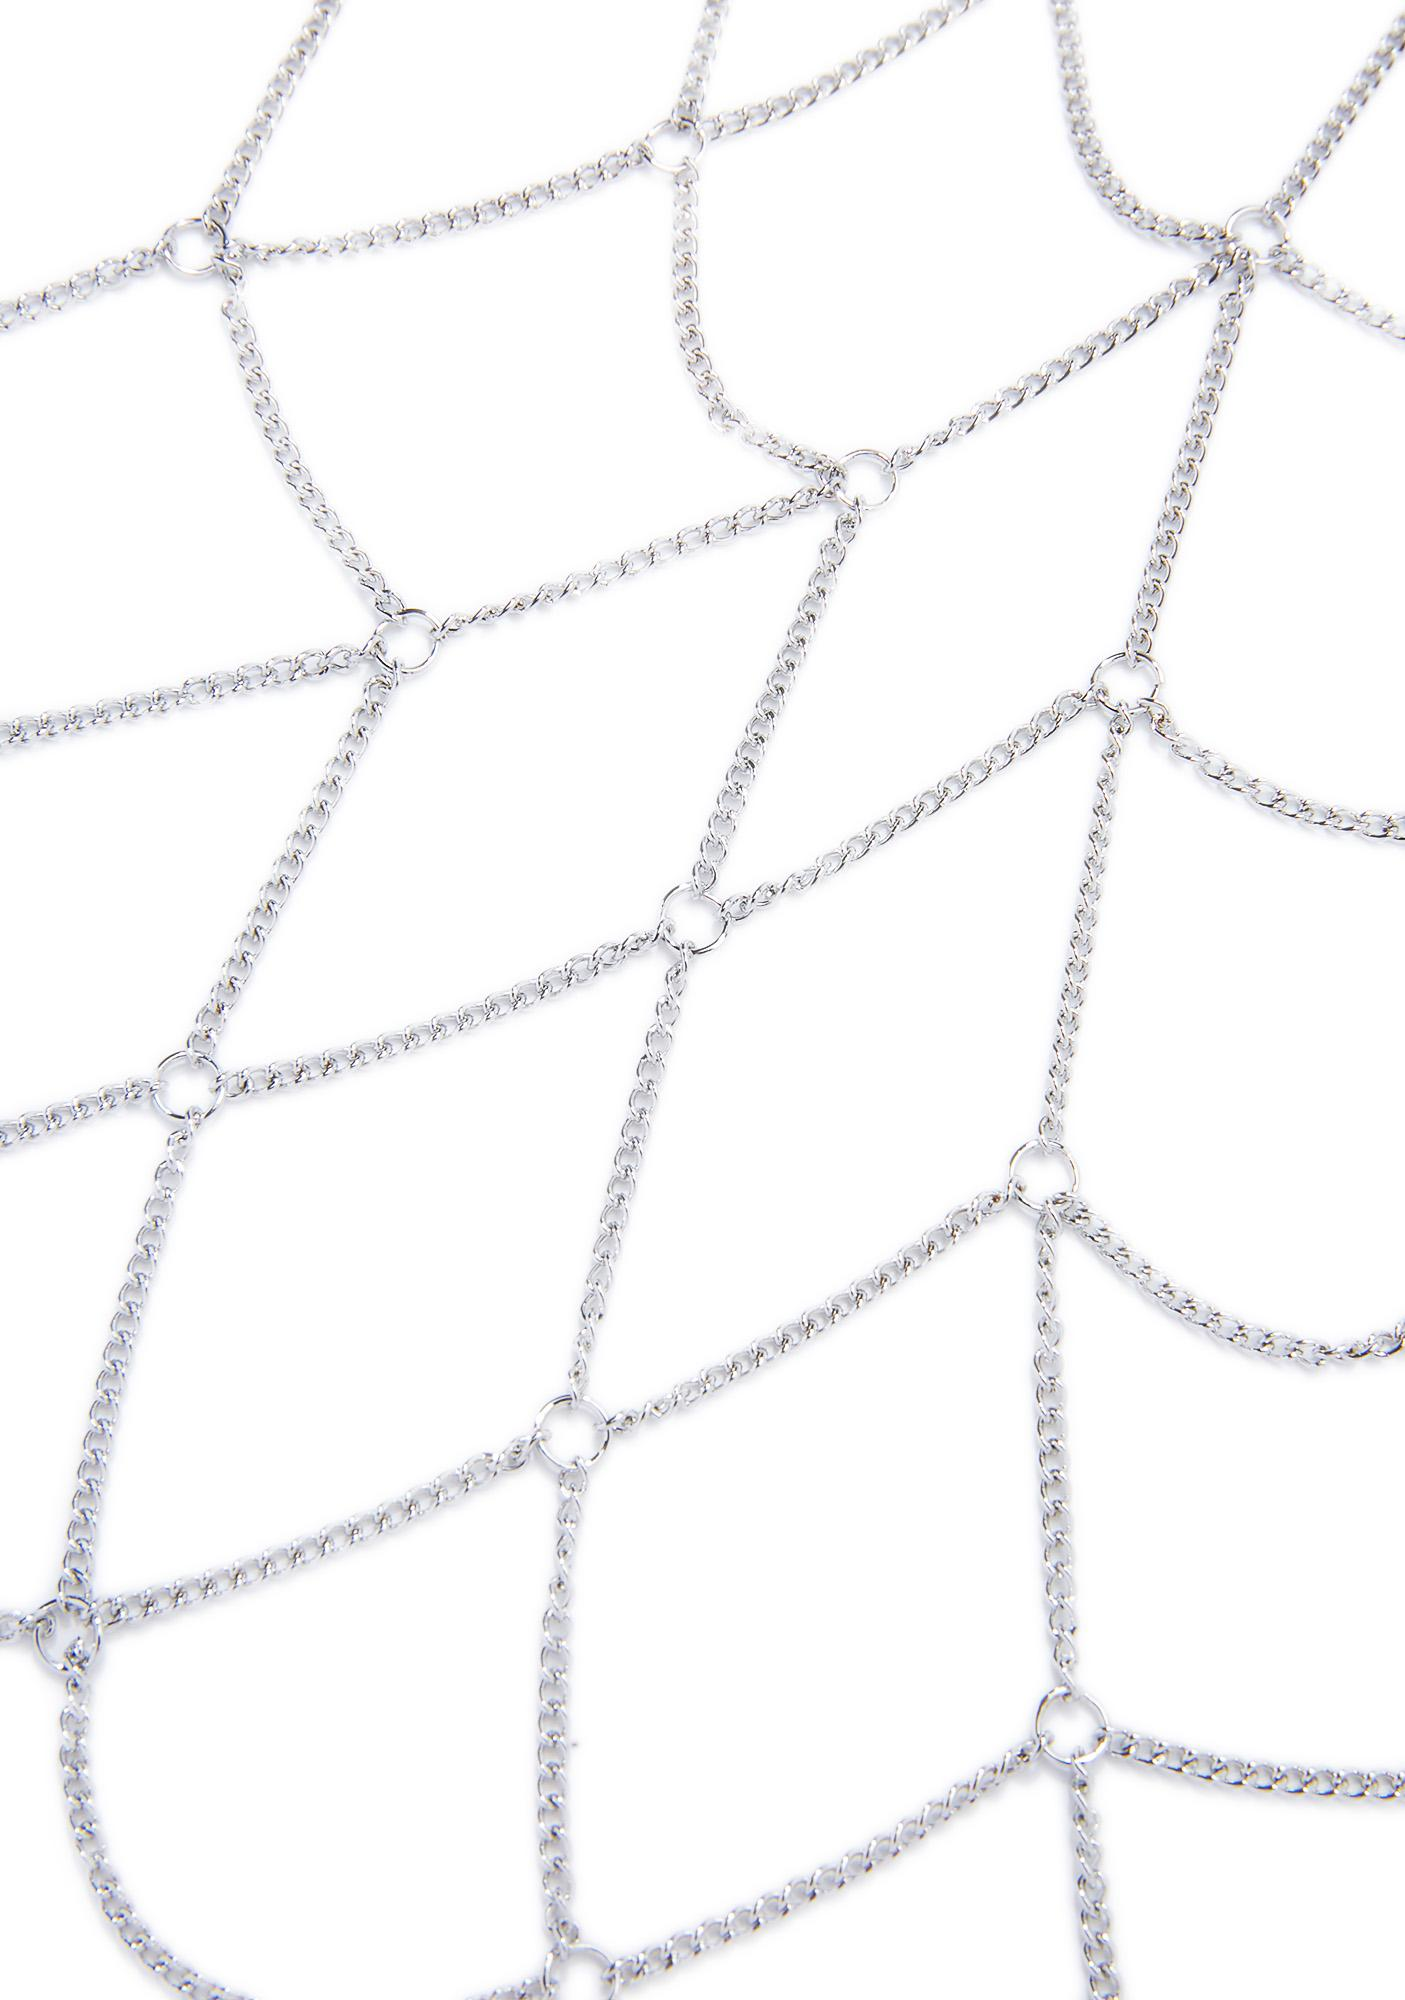 Complex Geometries Halter Body Chain